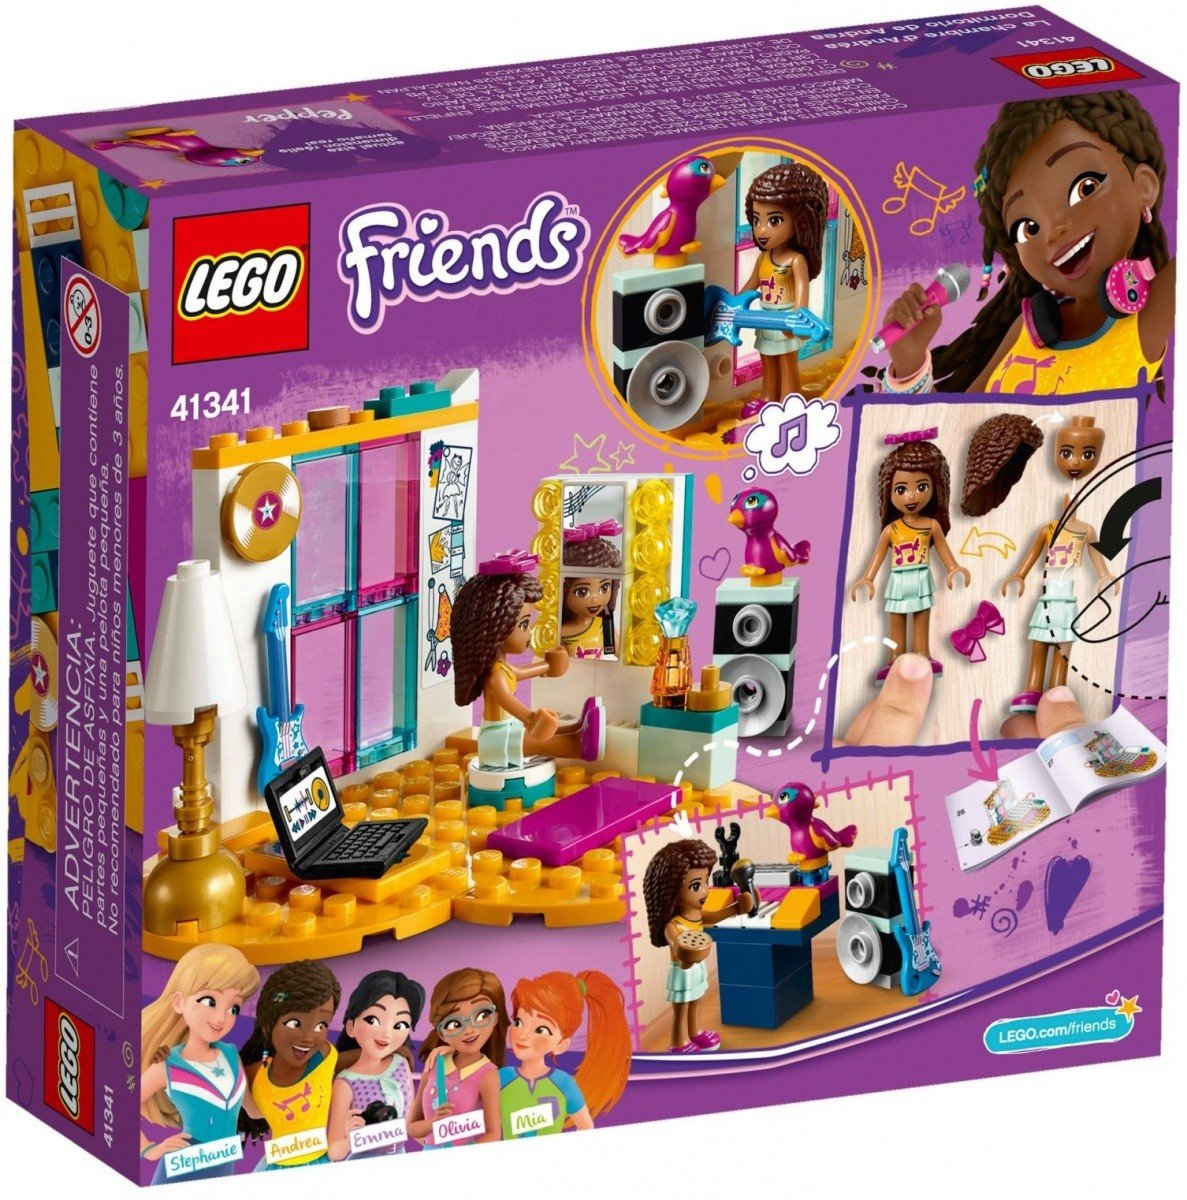 Lego Friends Sypialnia Andrei 41341 6 Friends Lego